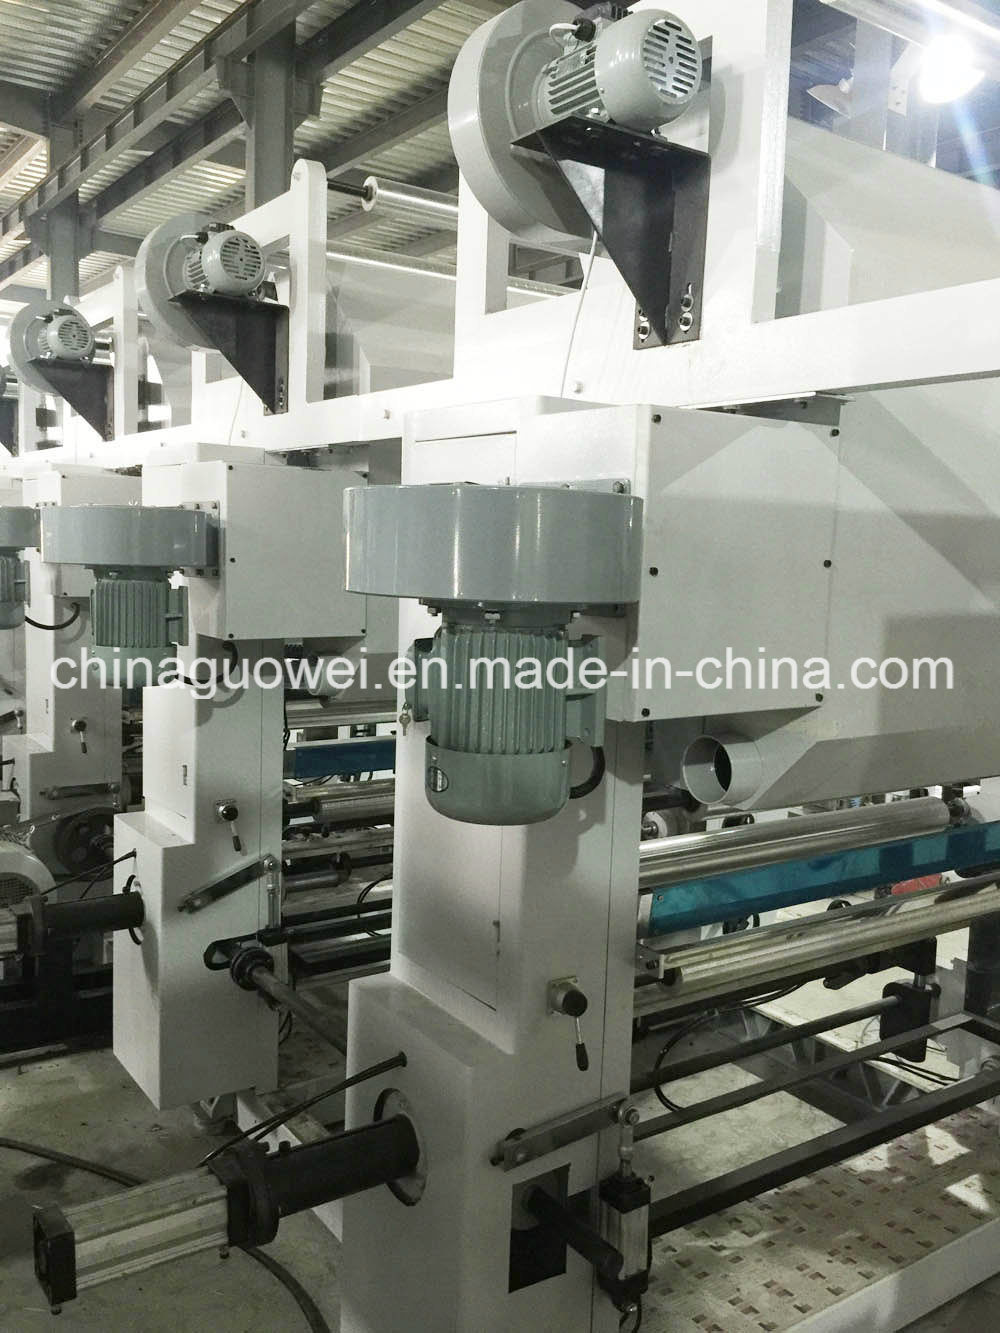 Economic Practical Computer Control Gravure Printing Press for Plastic Film